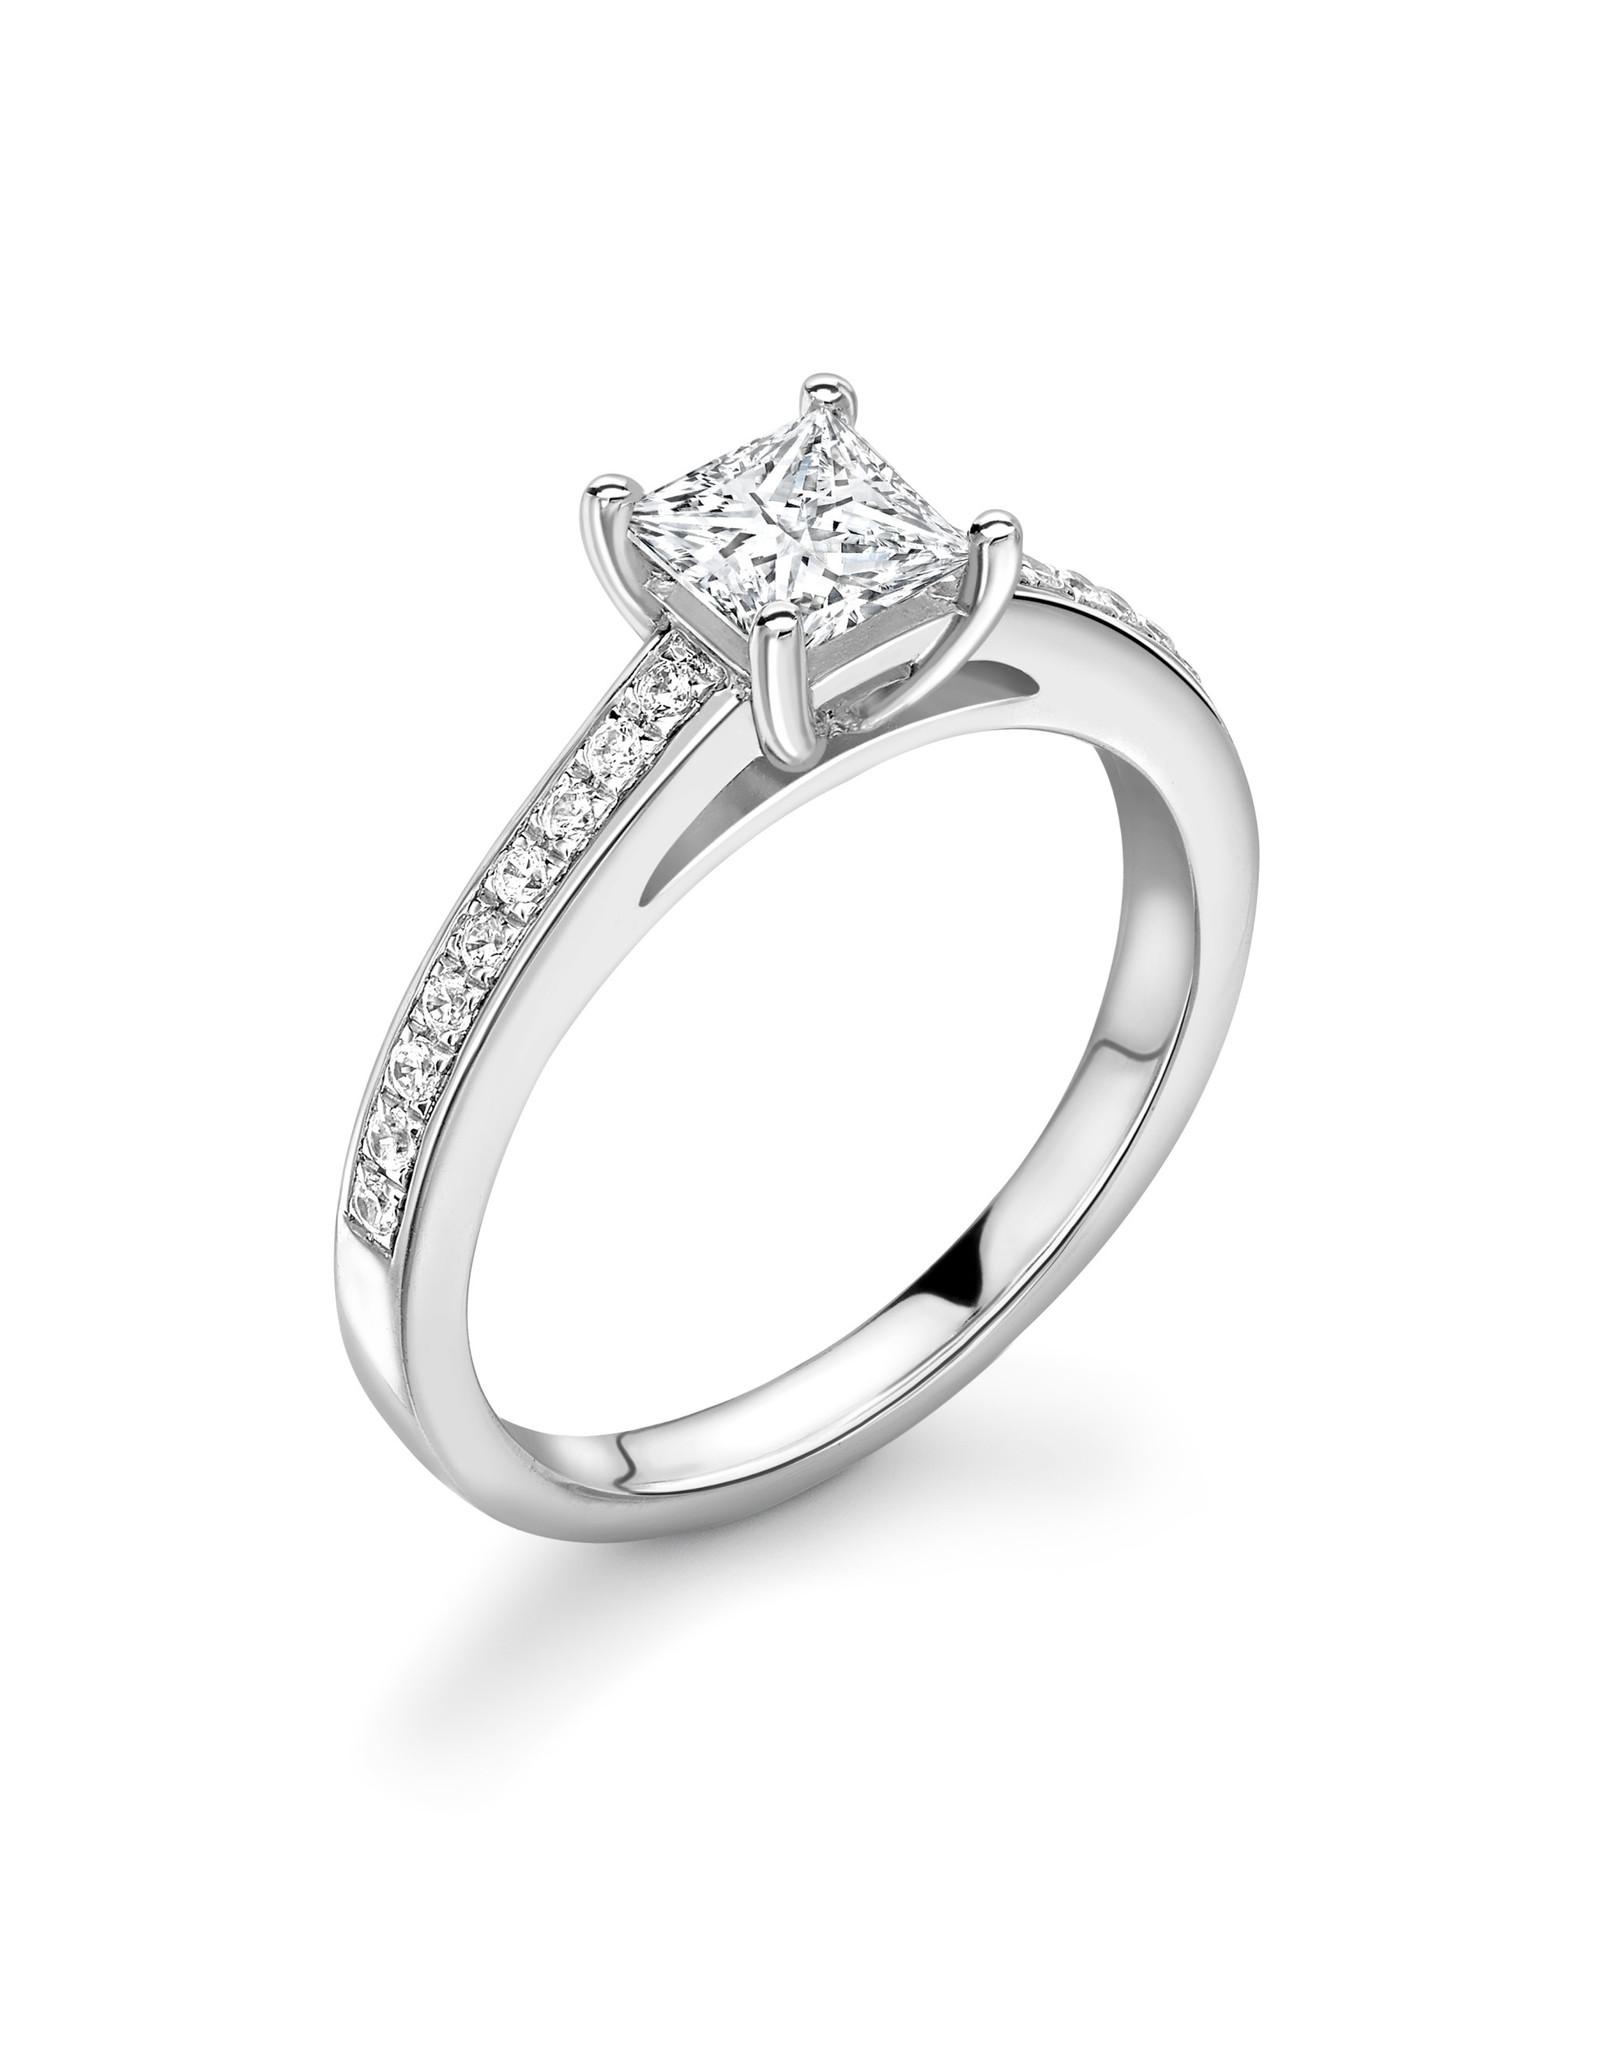 LVN Princesse Verlovingsring Met Zijsteentjes LVNRX4241